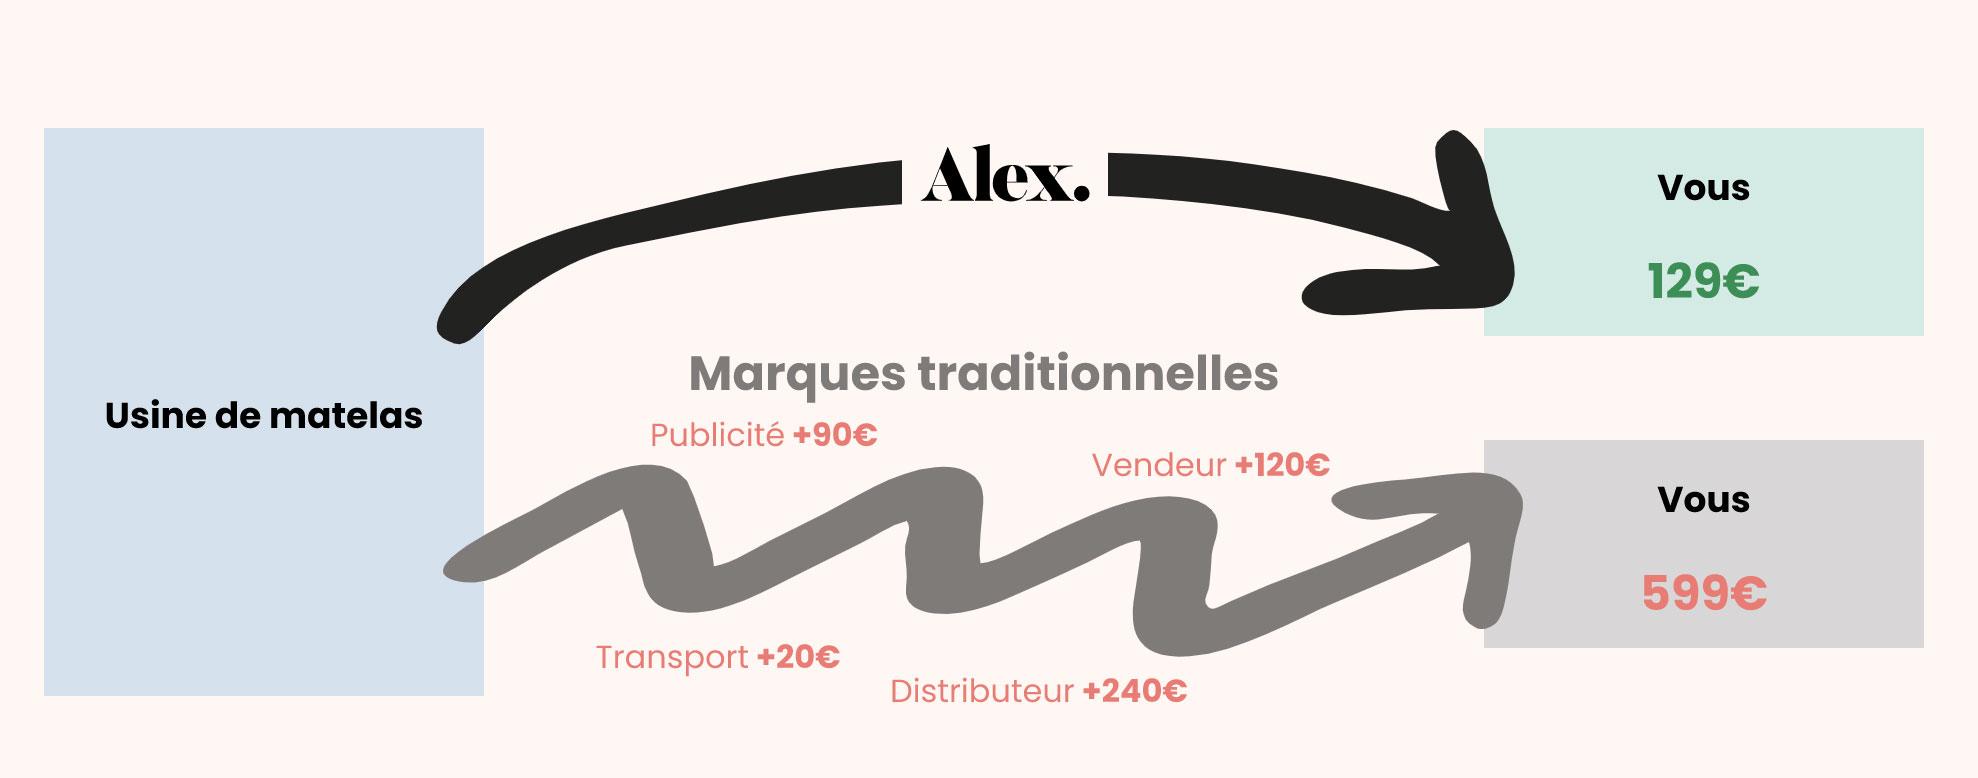 Concept matelas Alex